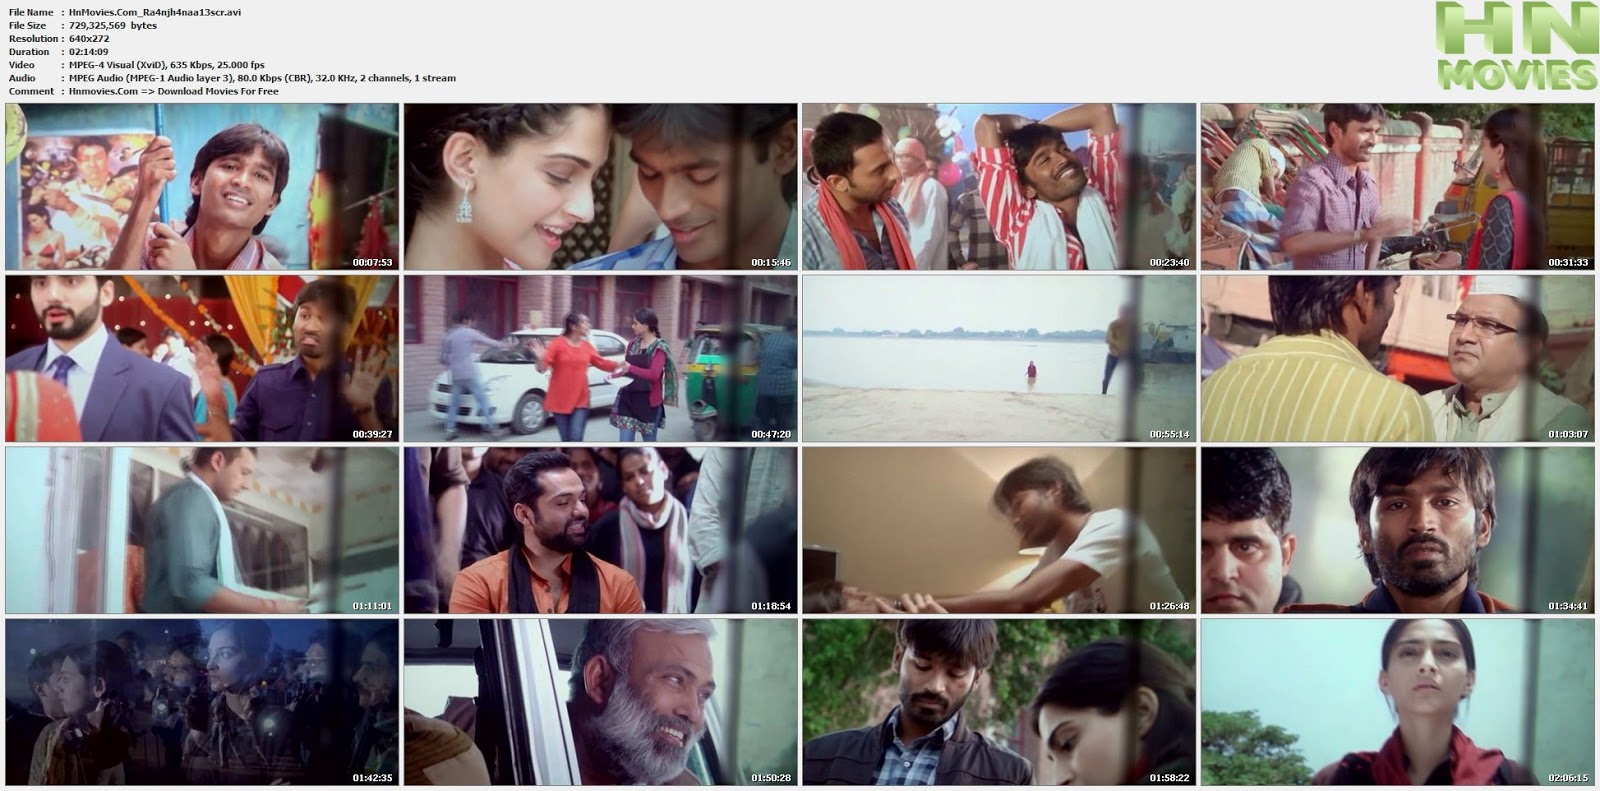 HnMovies.Com Ra4njh4naa13scr.avi